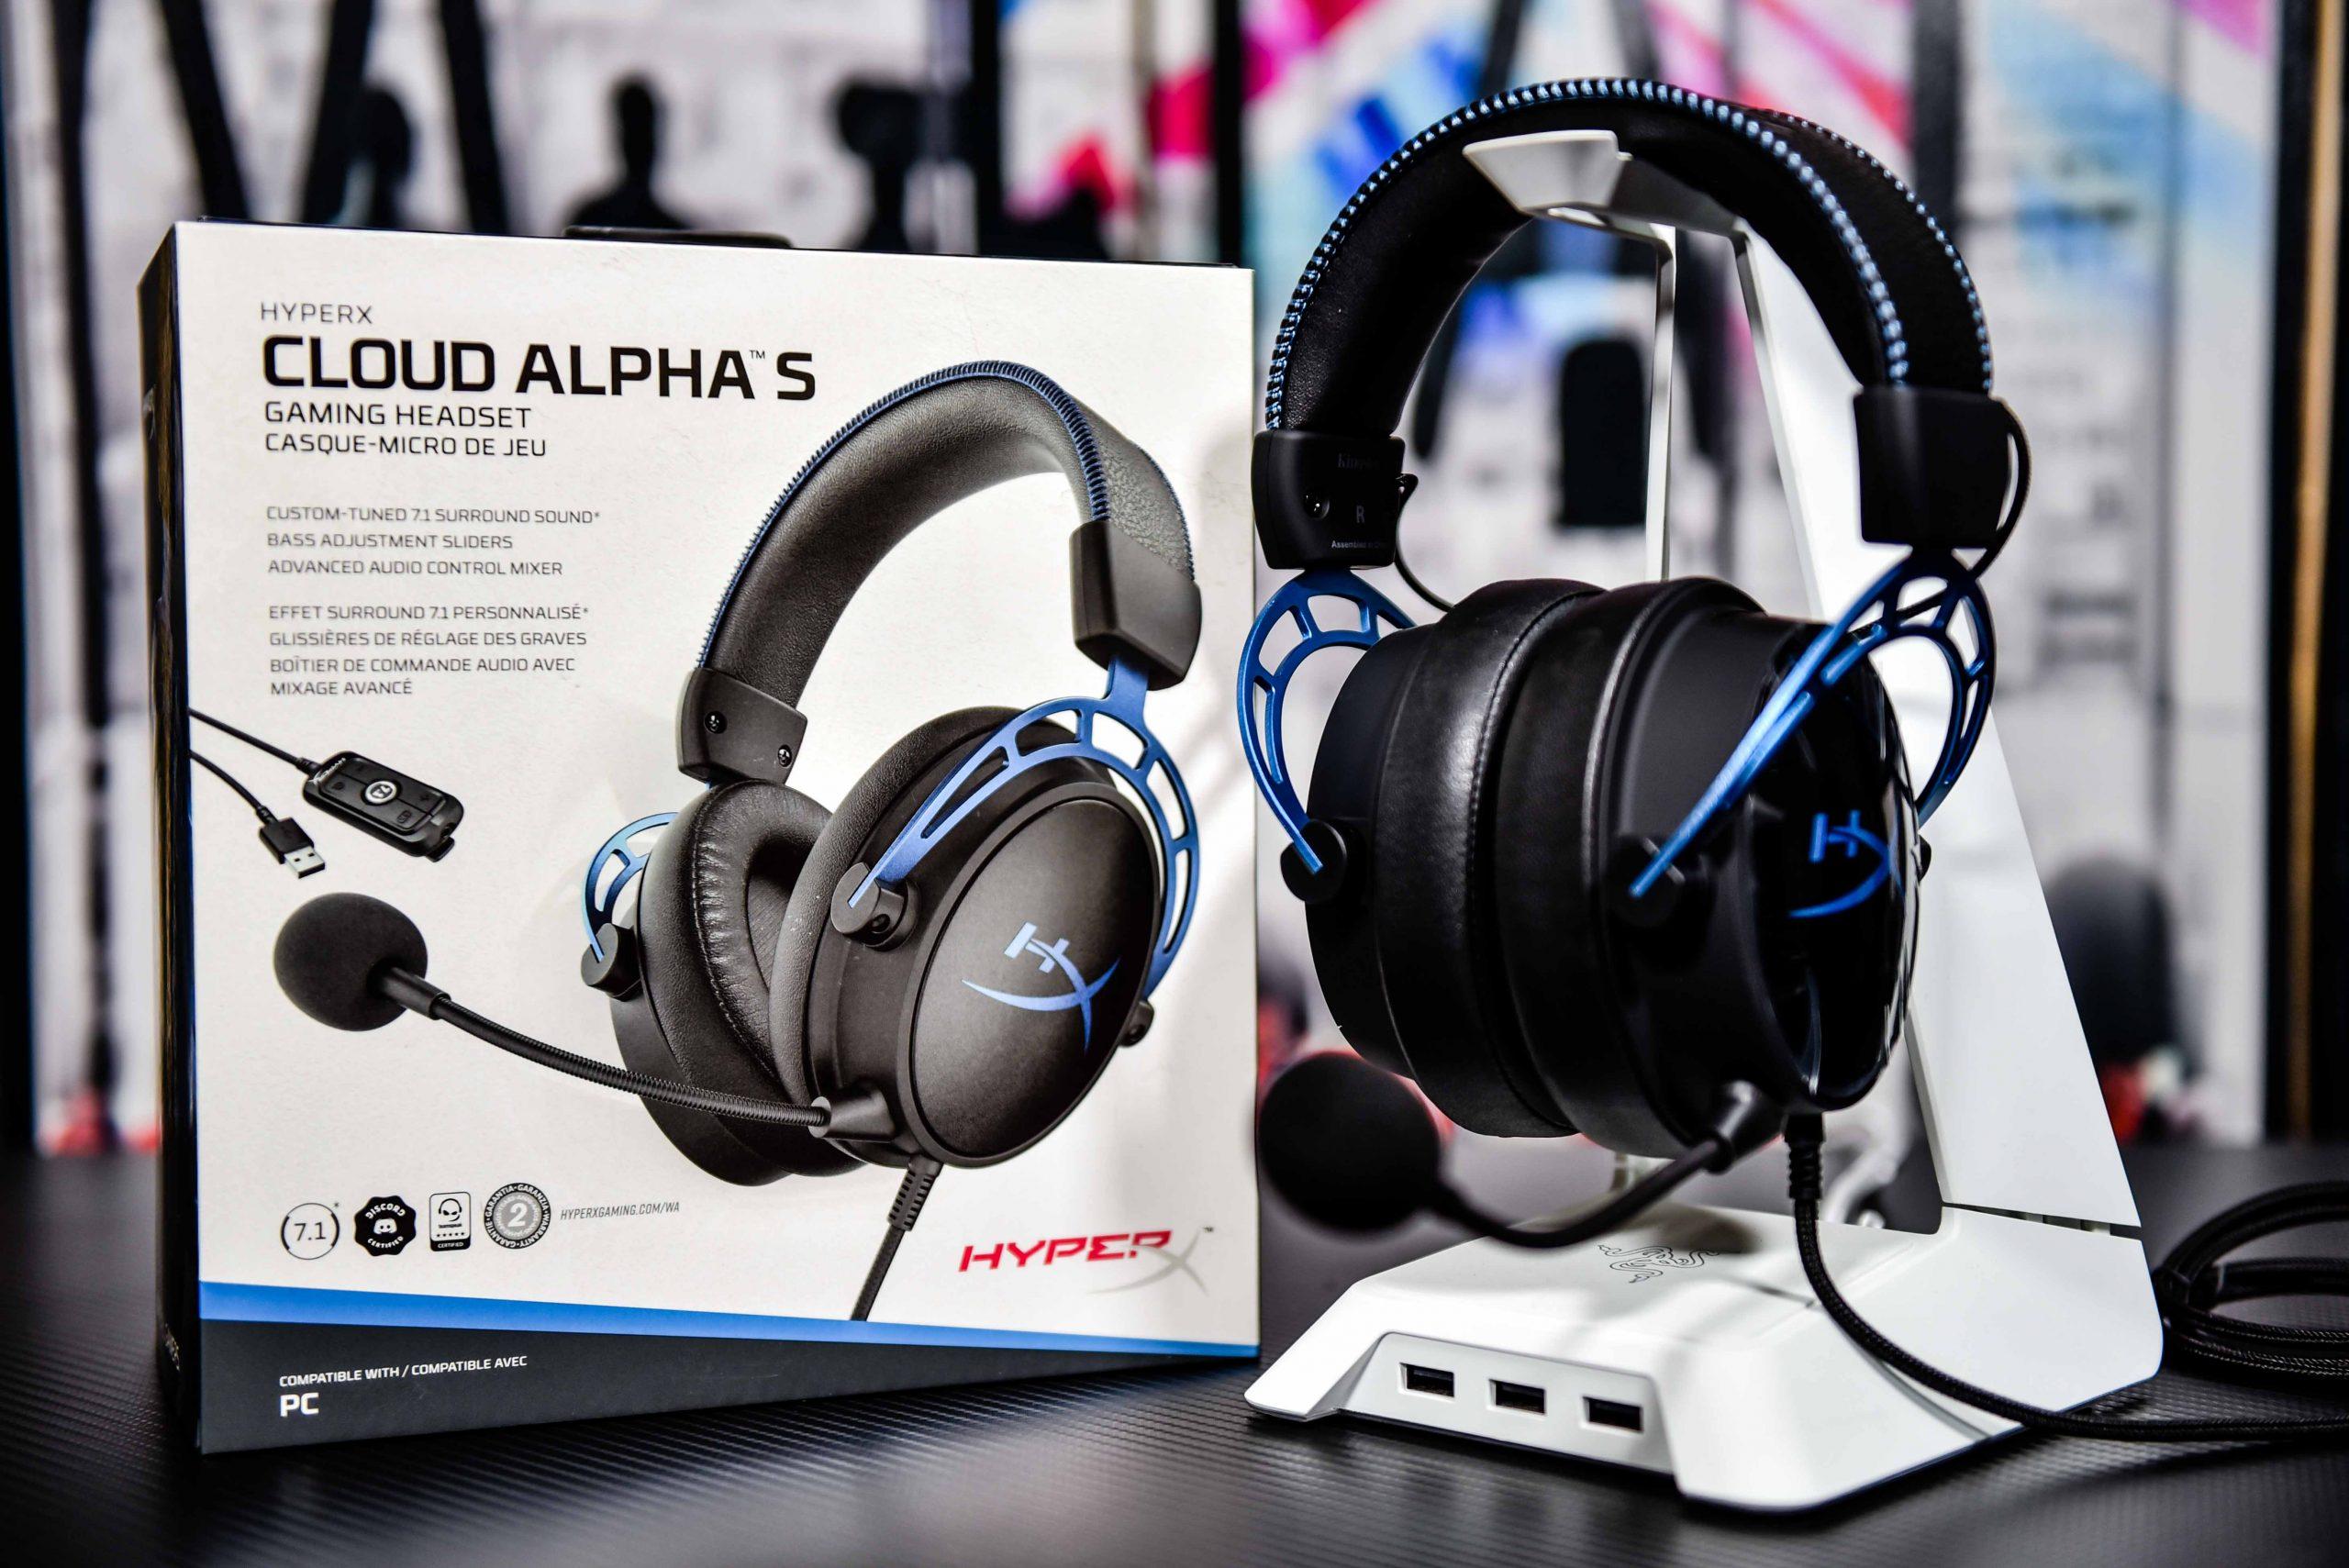 Cloud Alpha's Gaming Headset